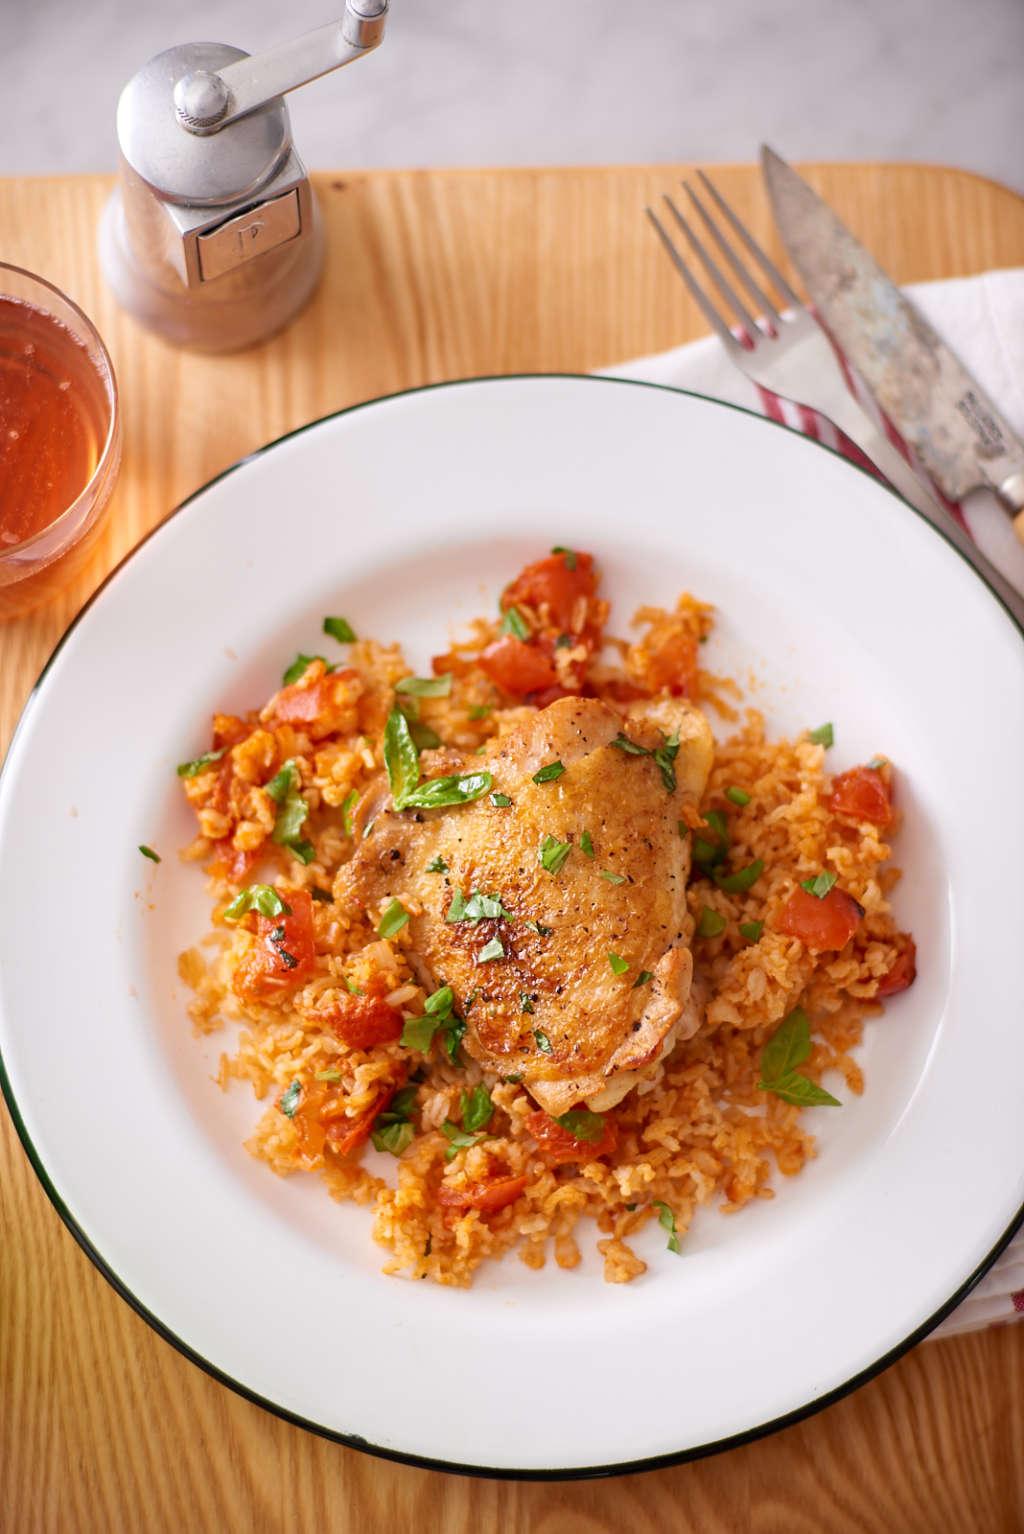 Tomato-Basil Chicken and Rice Casserole